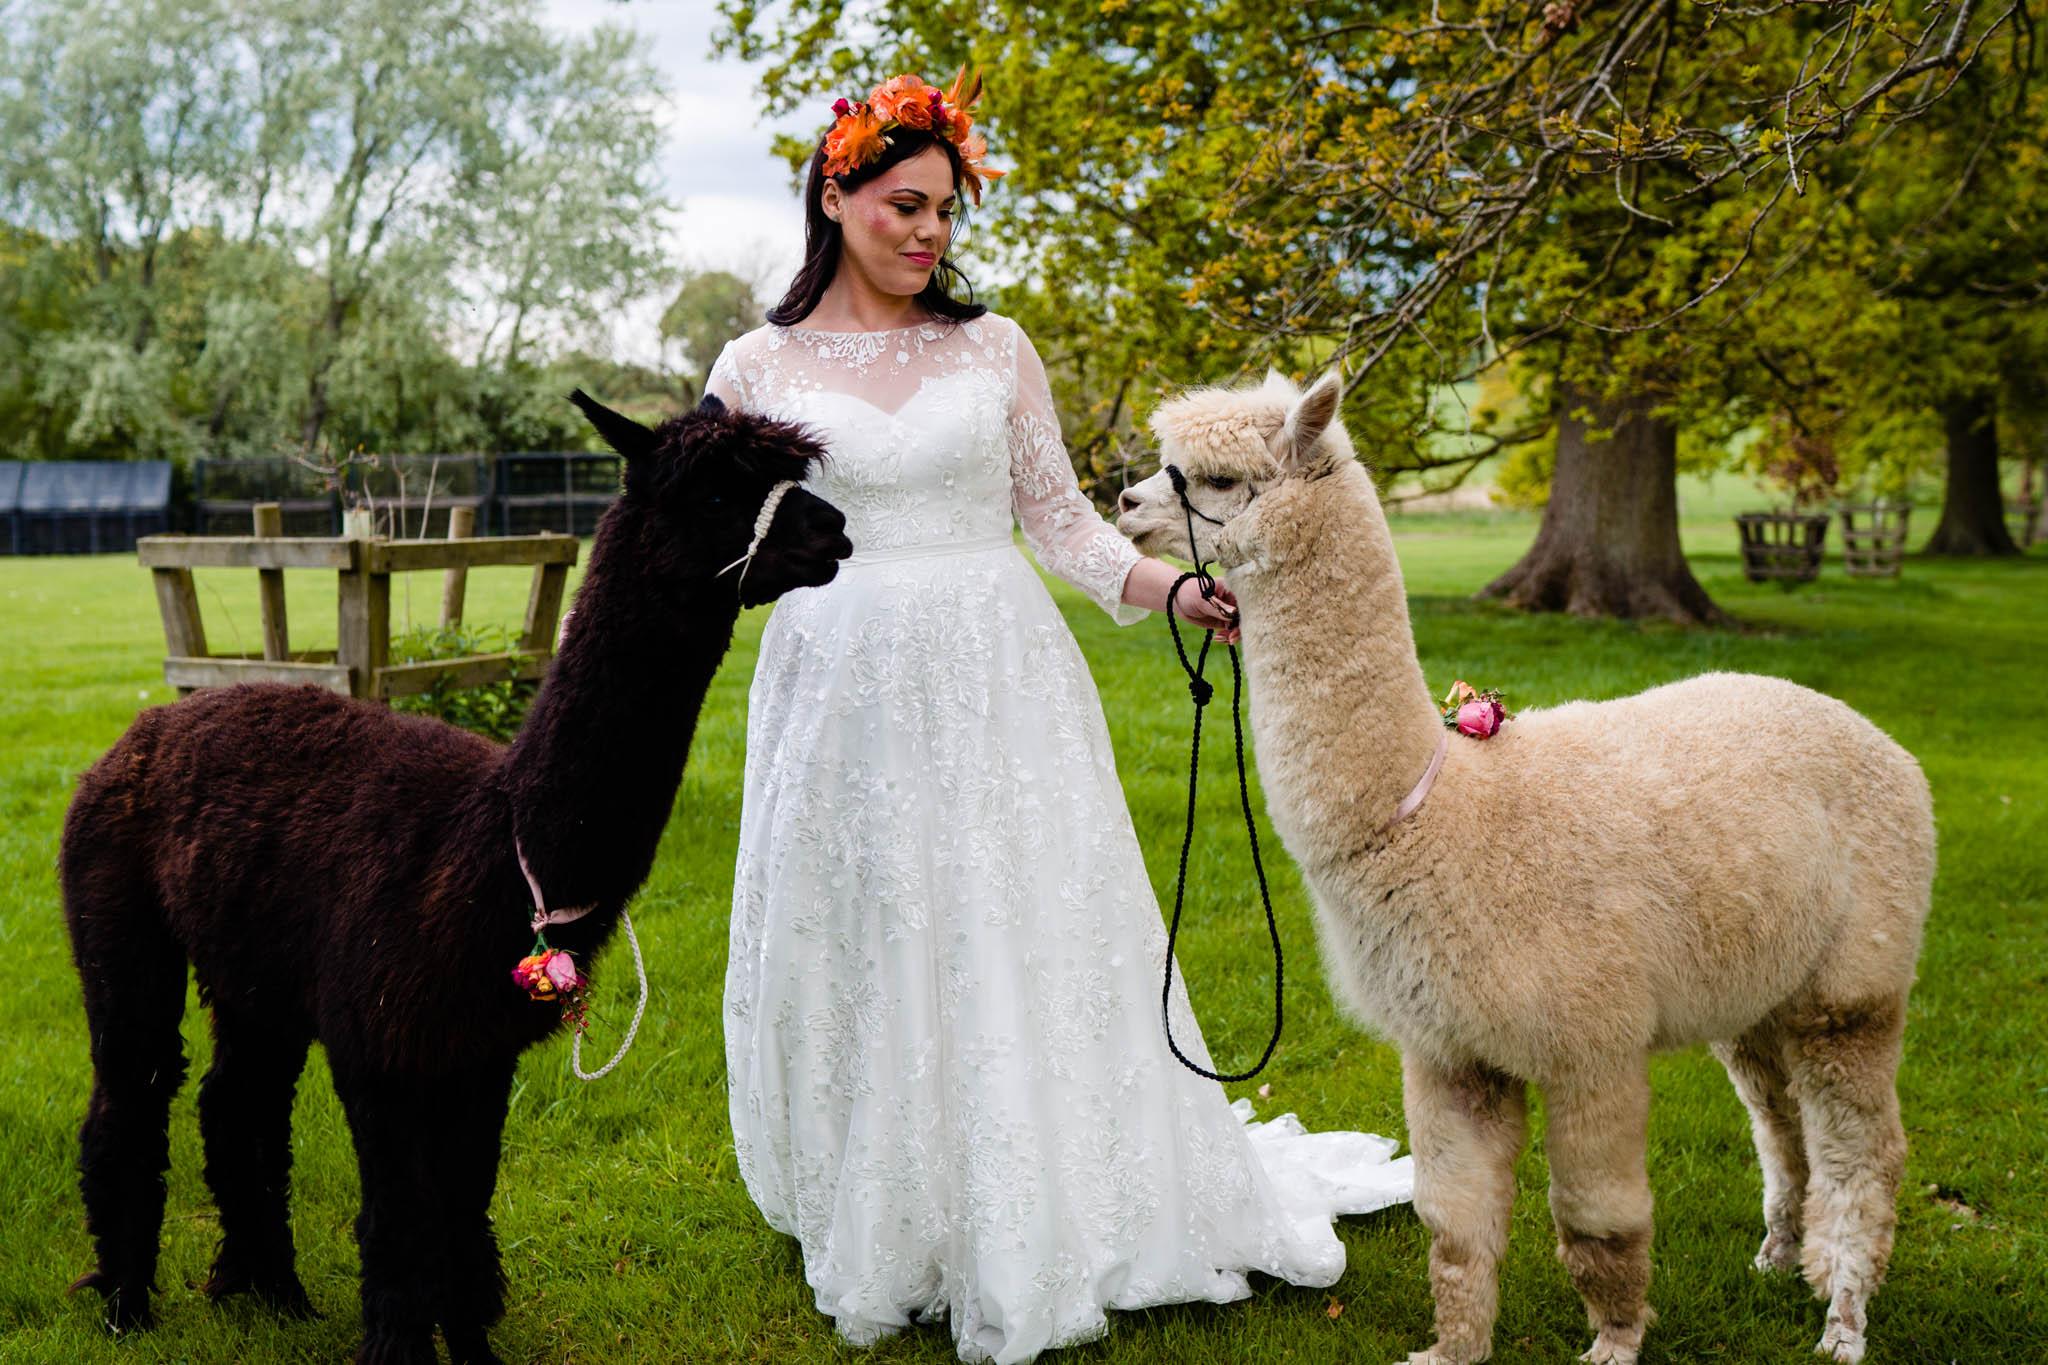 outdoor wedding bride with alpacas - field wedding - how to plan an outdoor wedding